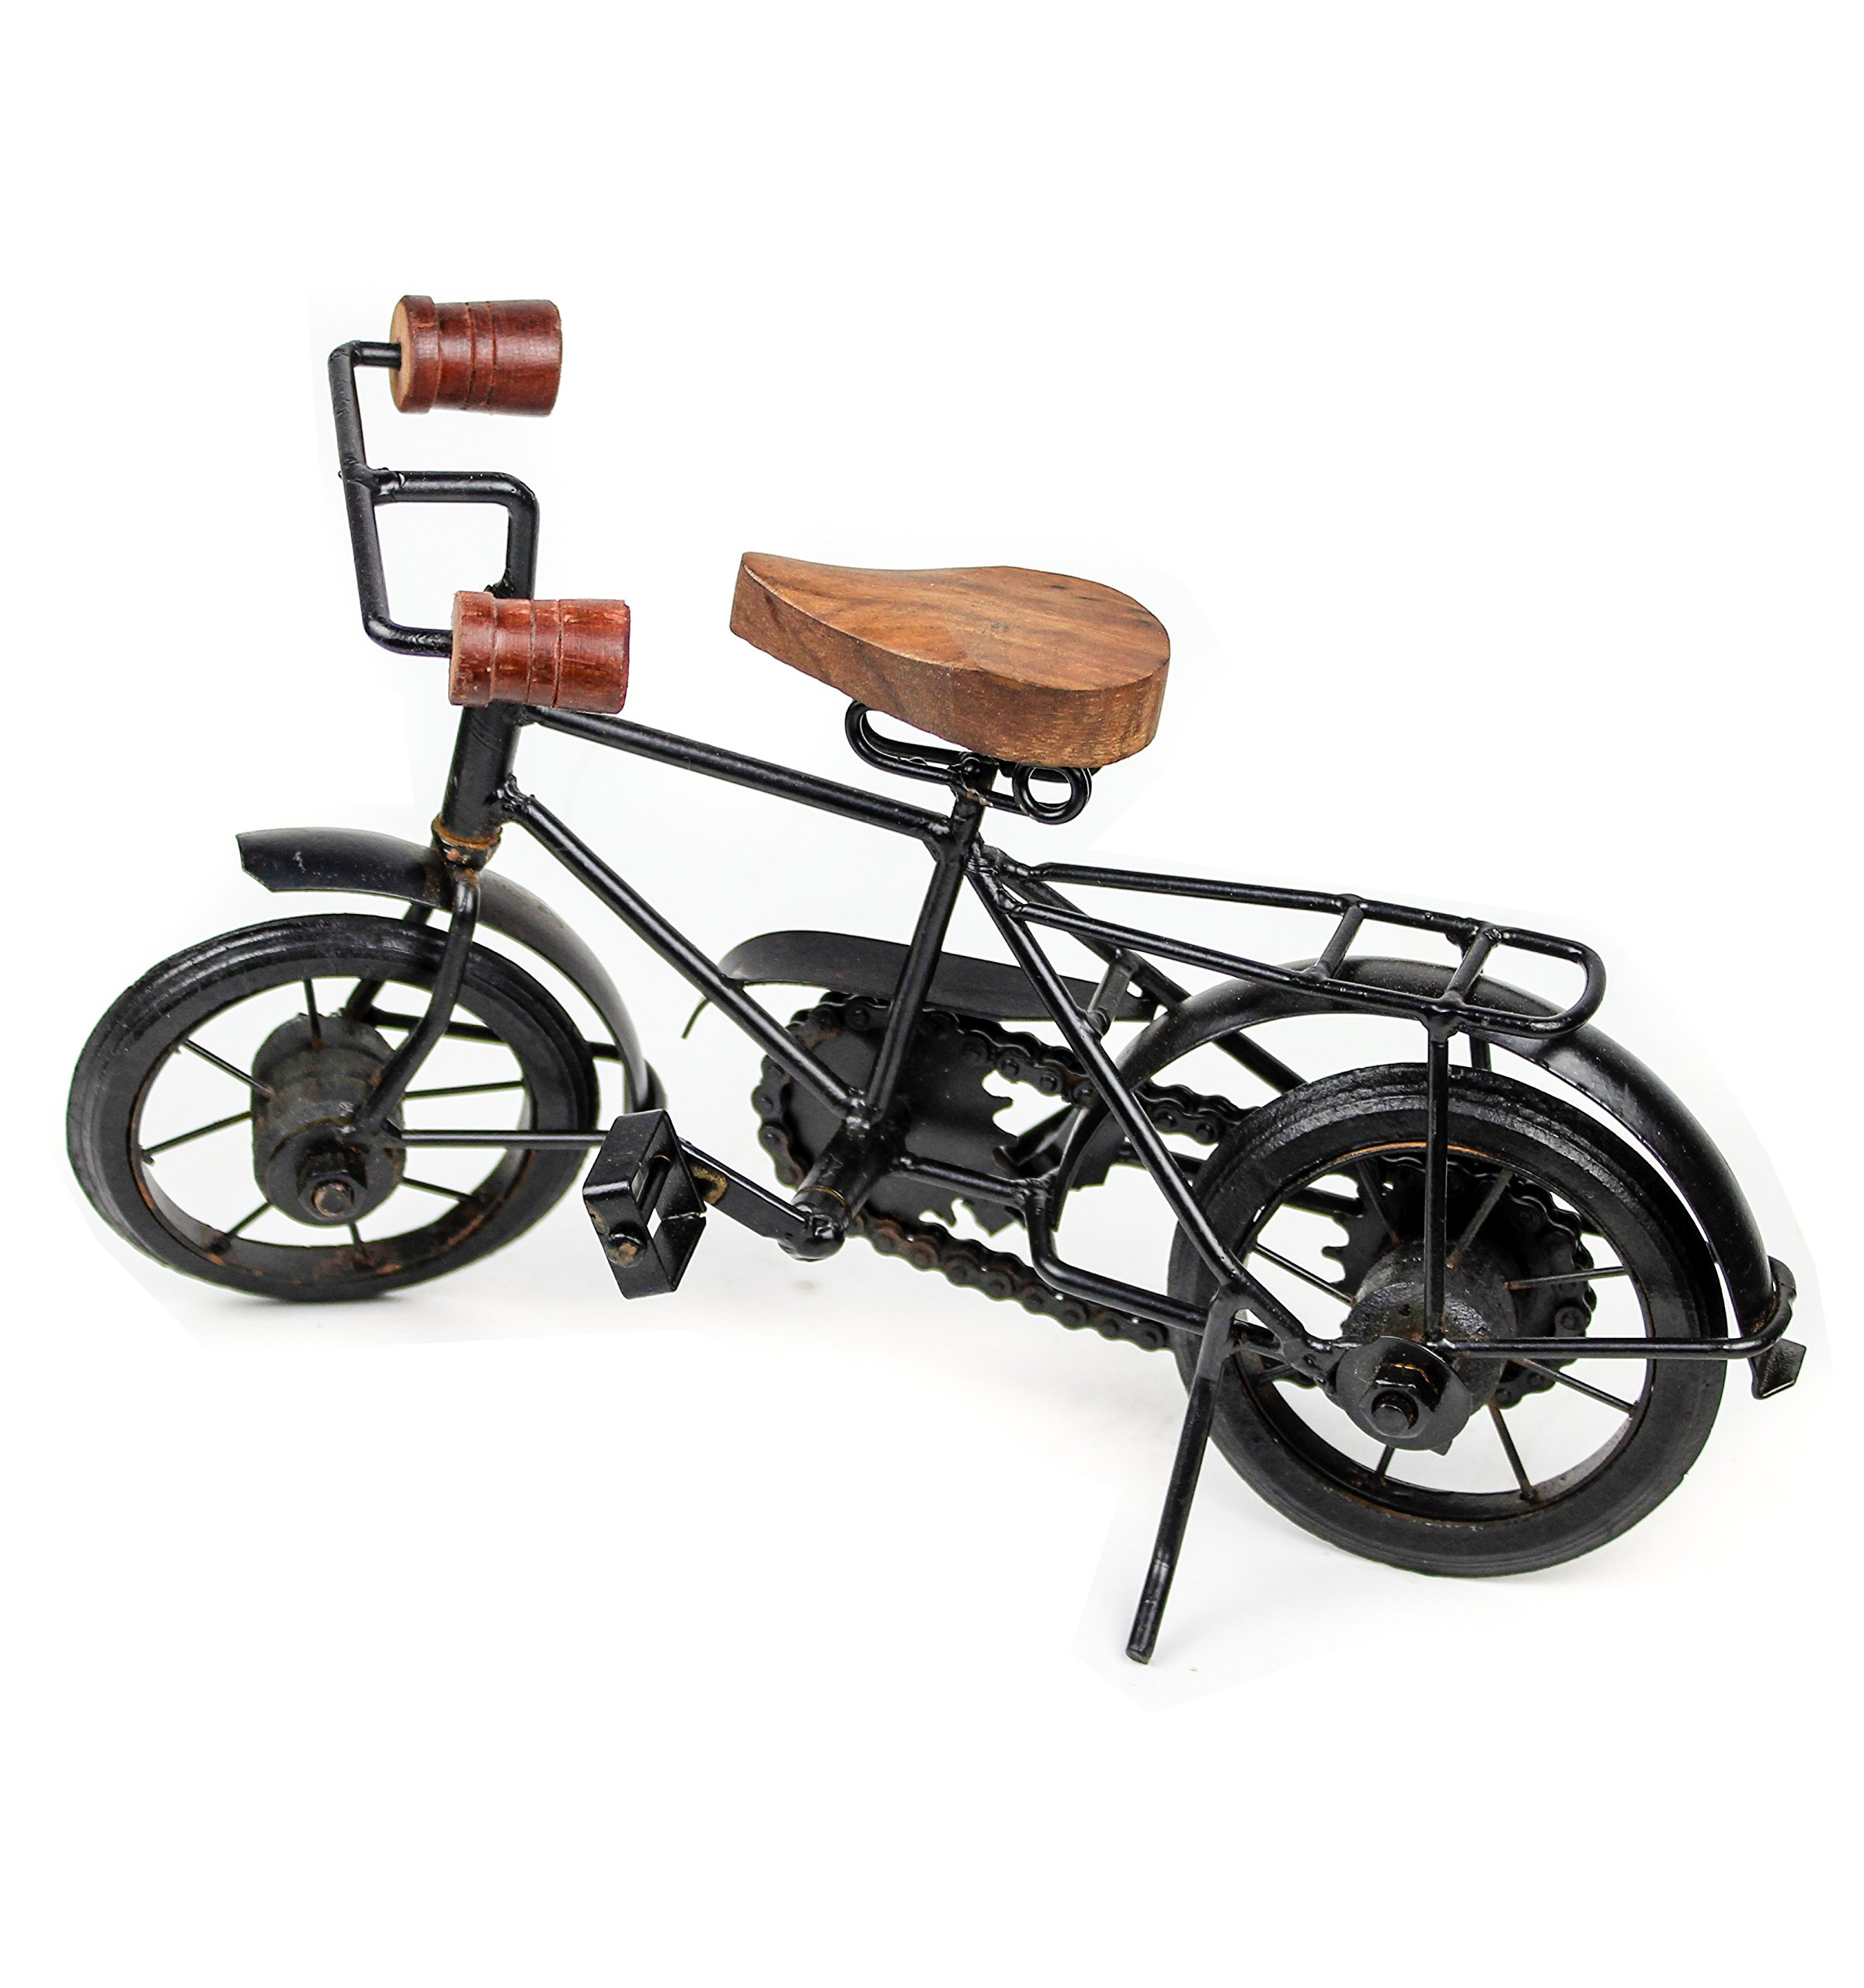 Nagina International Home Decor Iron Metal Crafted Beautiful Finger Bike   Table Decor Gifts Vehicle   Games Toy Cycle (Postman) by Nagina International (Image #1)